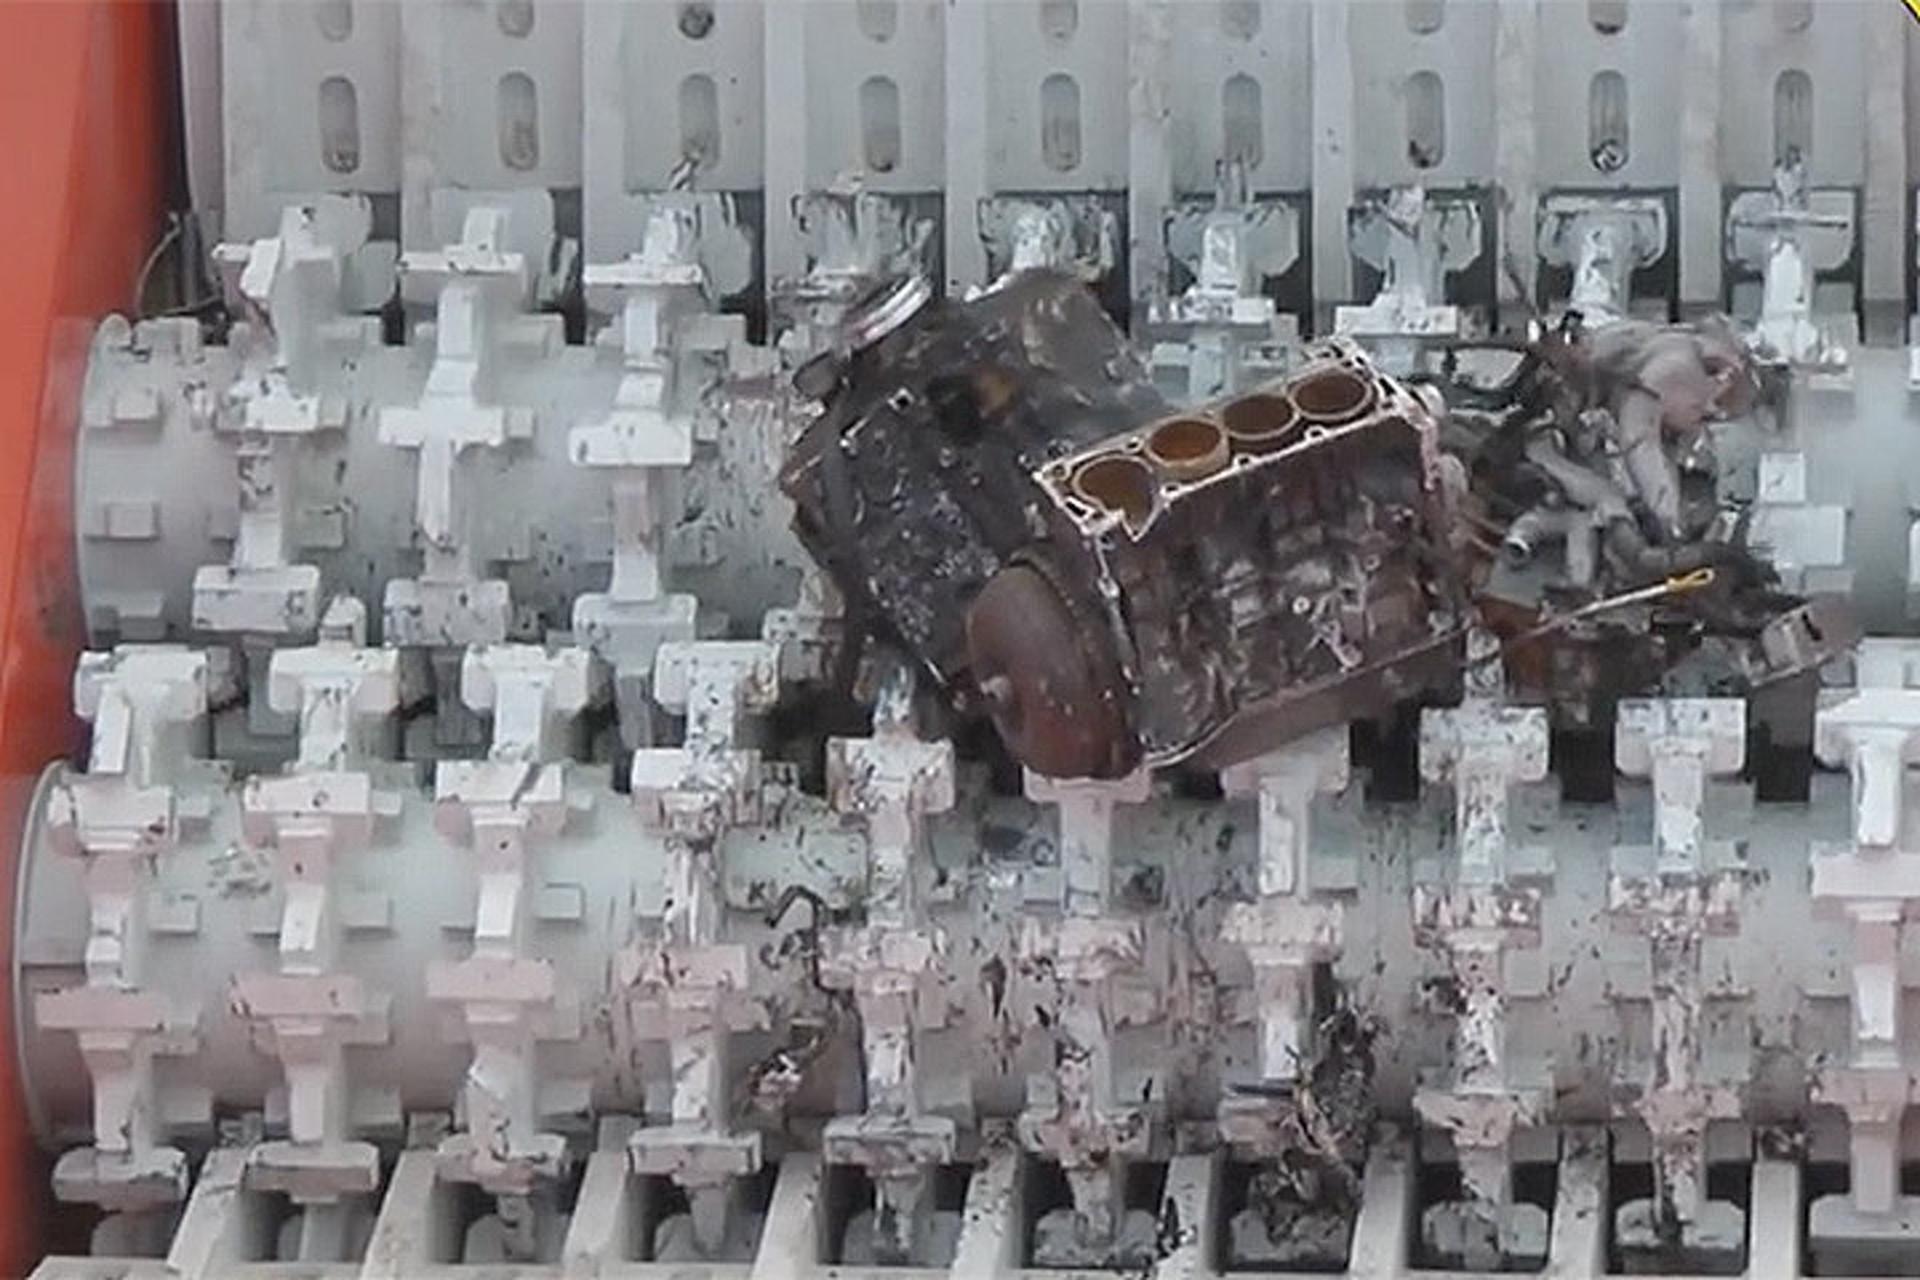 Watch This Shredder Devour Old Engines Like Dessert